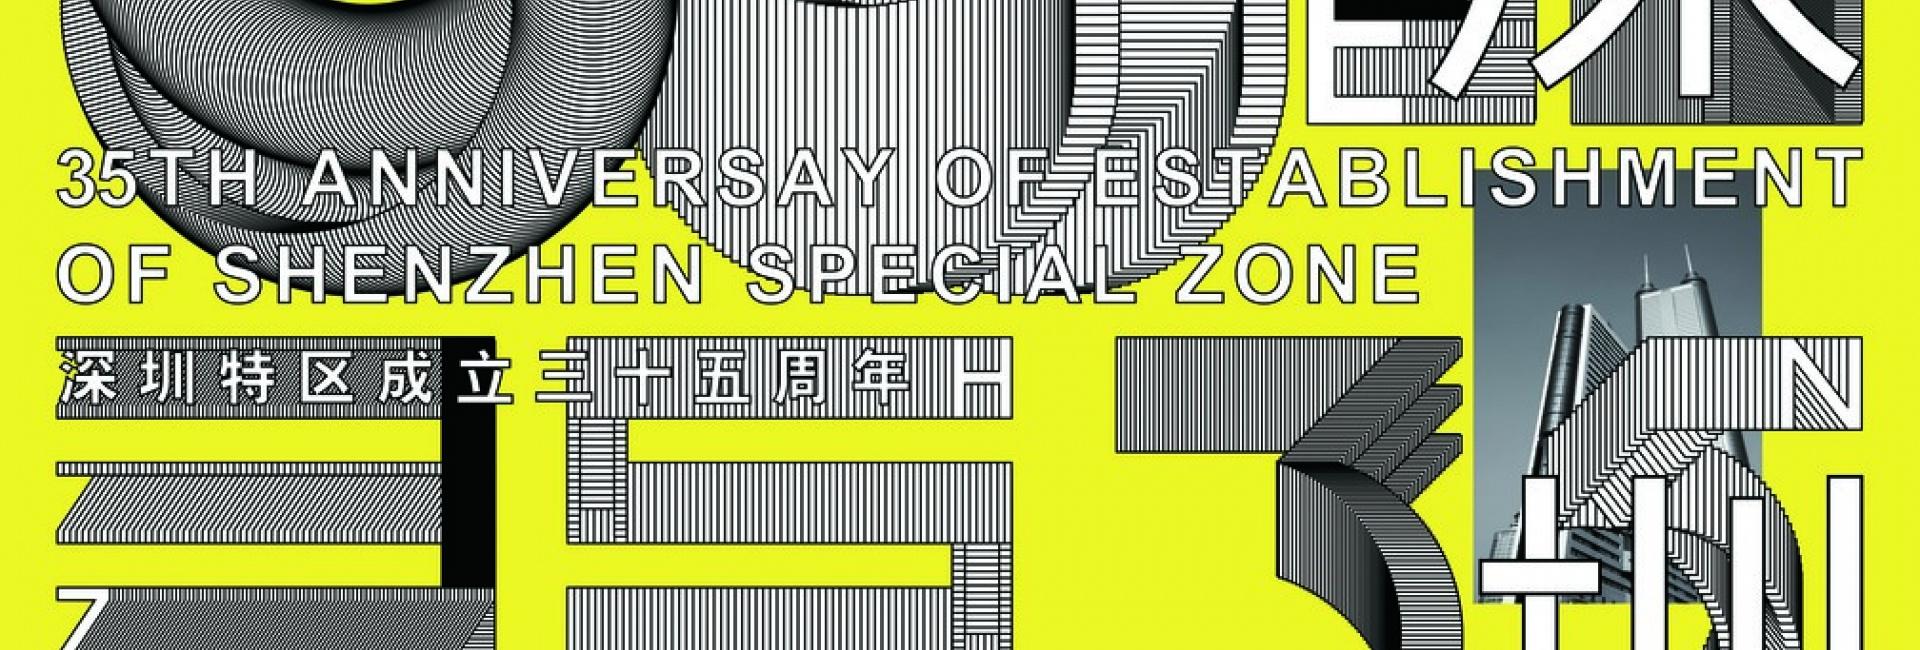 35th Anniversay of Establishment of Shenzhen Special Zone 2